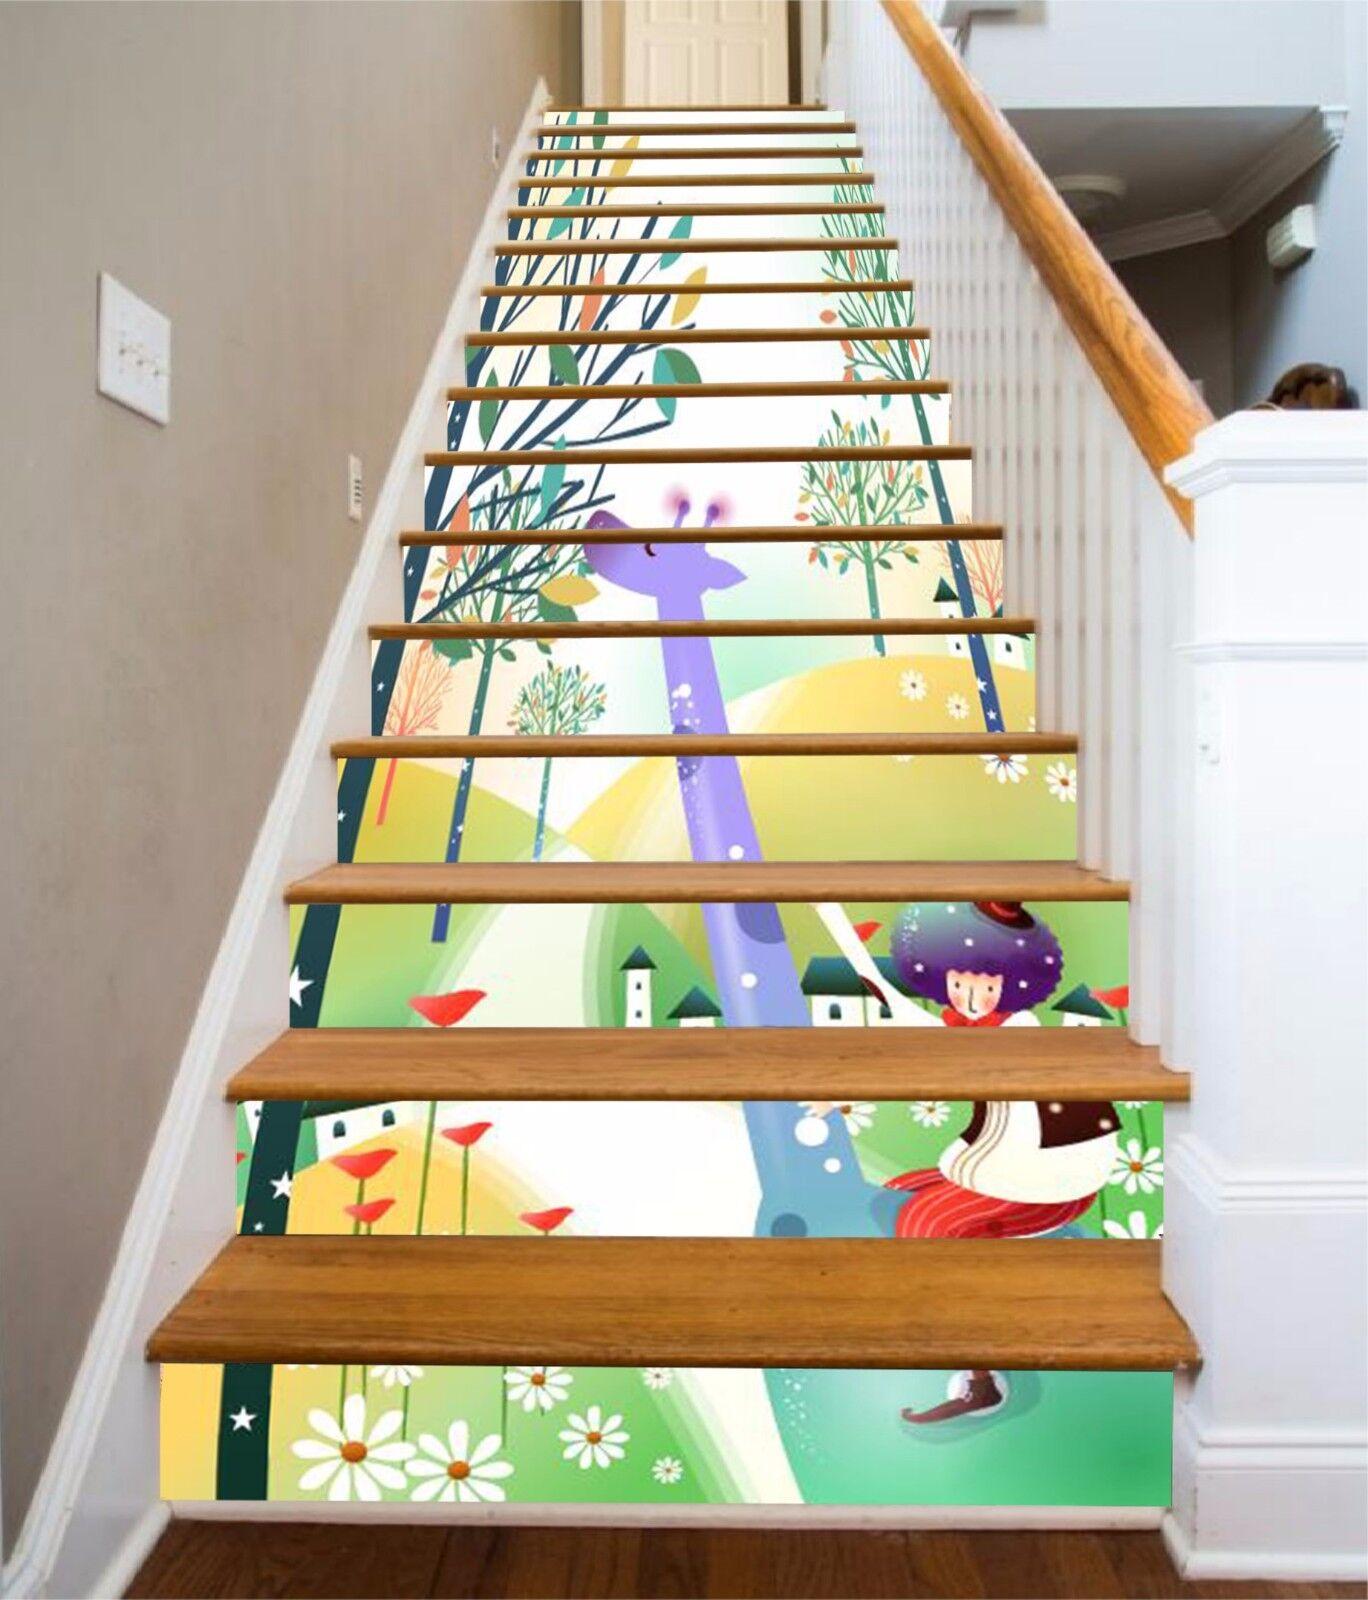 3D Cartoon tree 353 Stair Risers Decoration Photo Mural Vinyl Decal Wallpaper UK